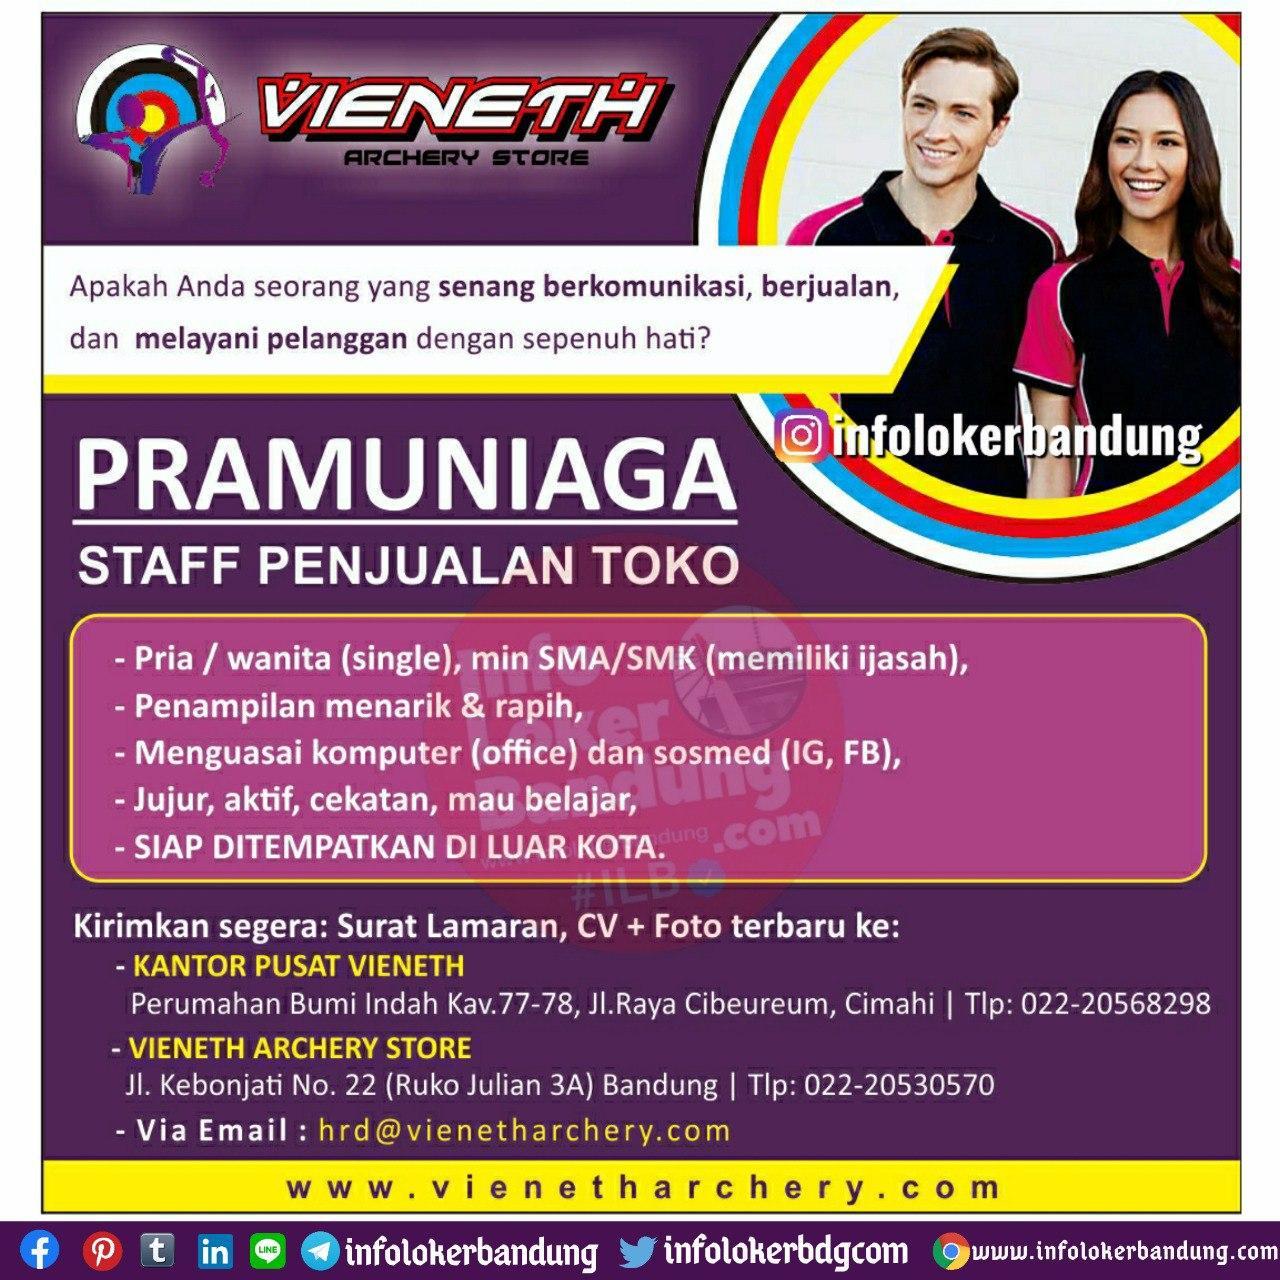 Lowongan Kerja Pramunia ( Staff Penjualan Toko ) Vieneth Archery Store Bandung Agustus 2020